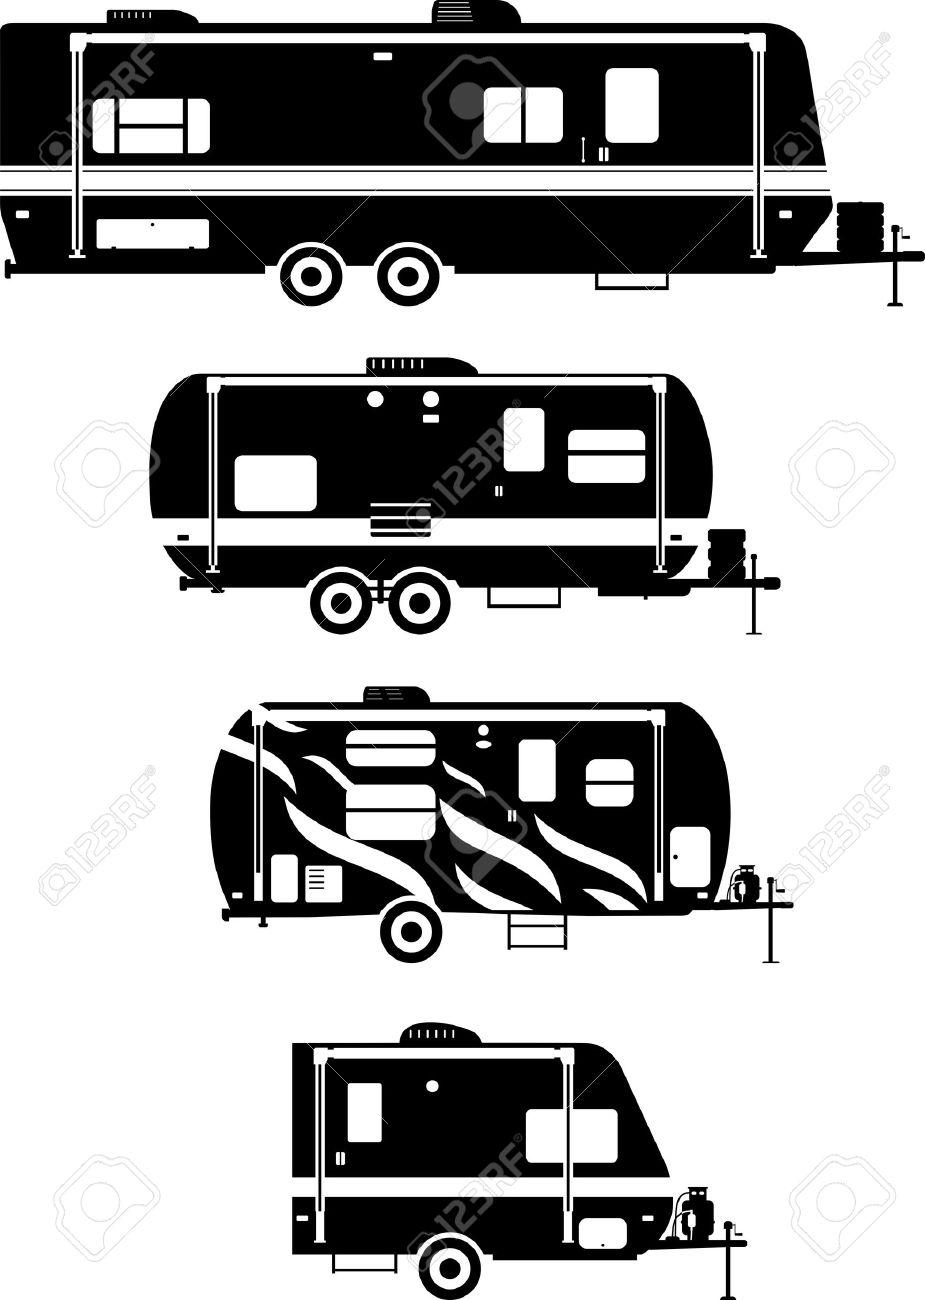 Silhouette Illustration Of Travel Trailer Caravans On A White Background Stock Vector